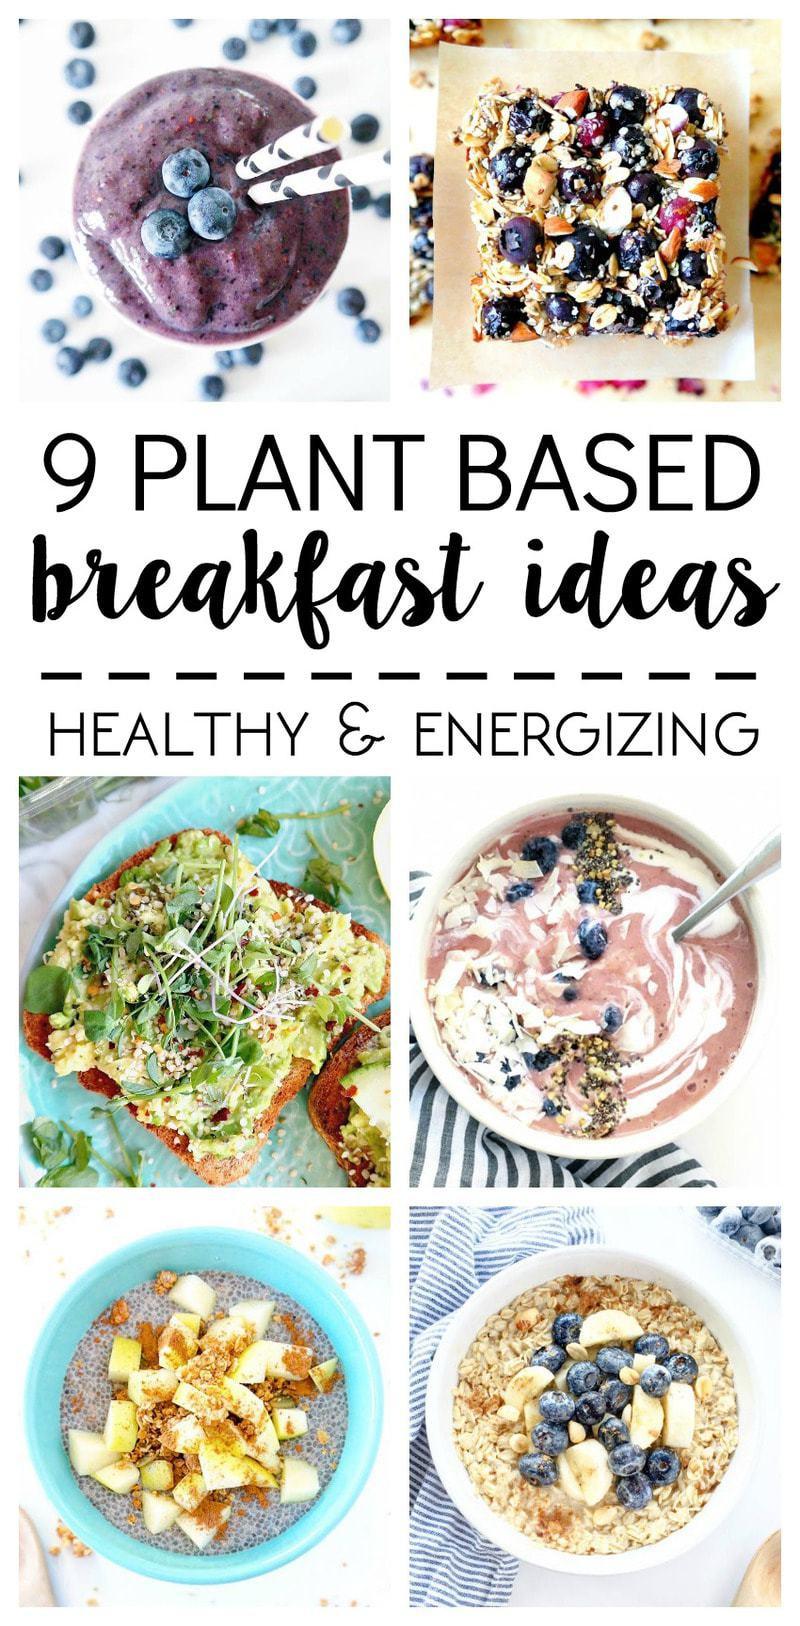 Vegan Breakfast Ideas Plant Based  What I Ate 9 Plant Based Breakfast Ideas The Glowing Fridge